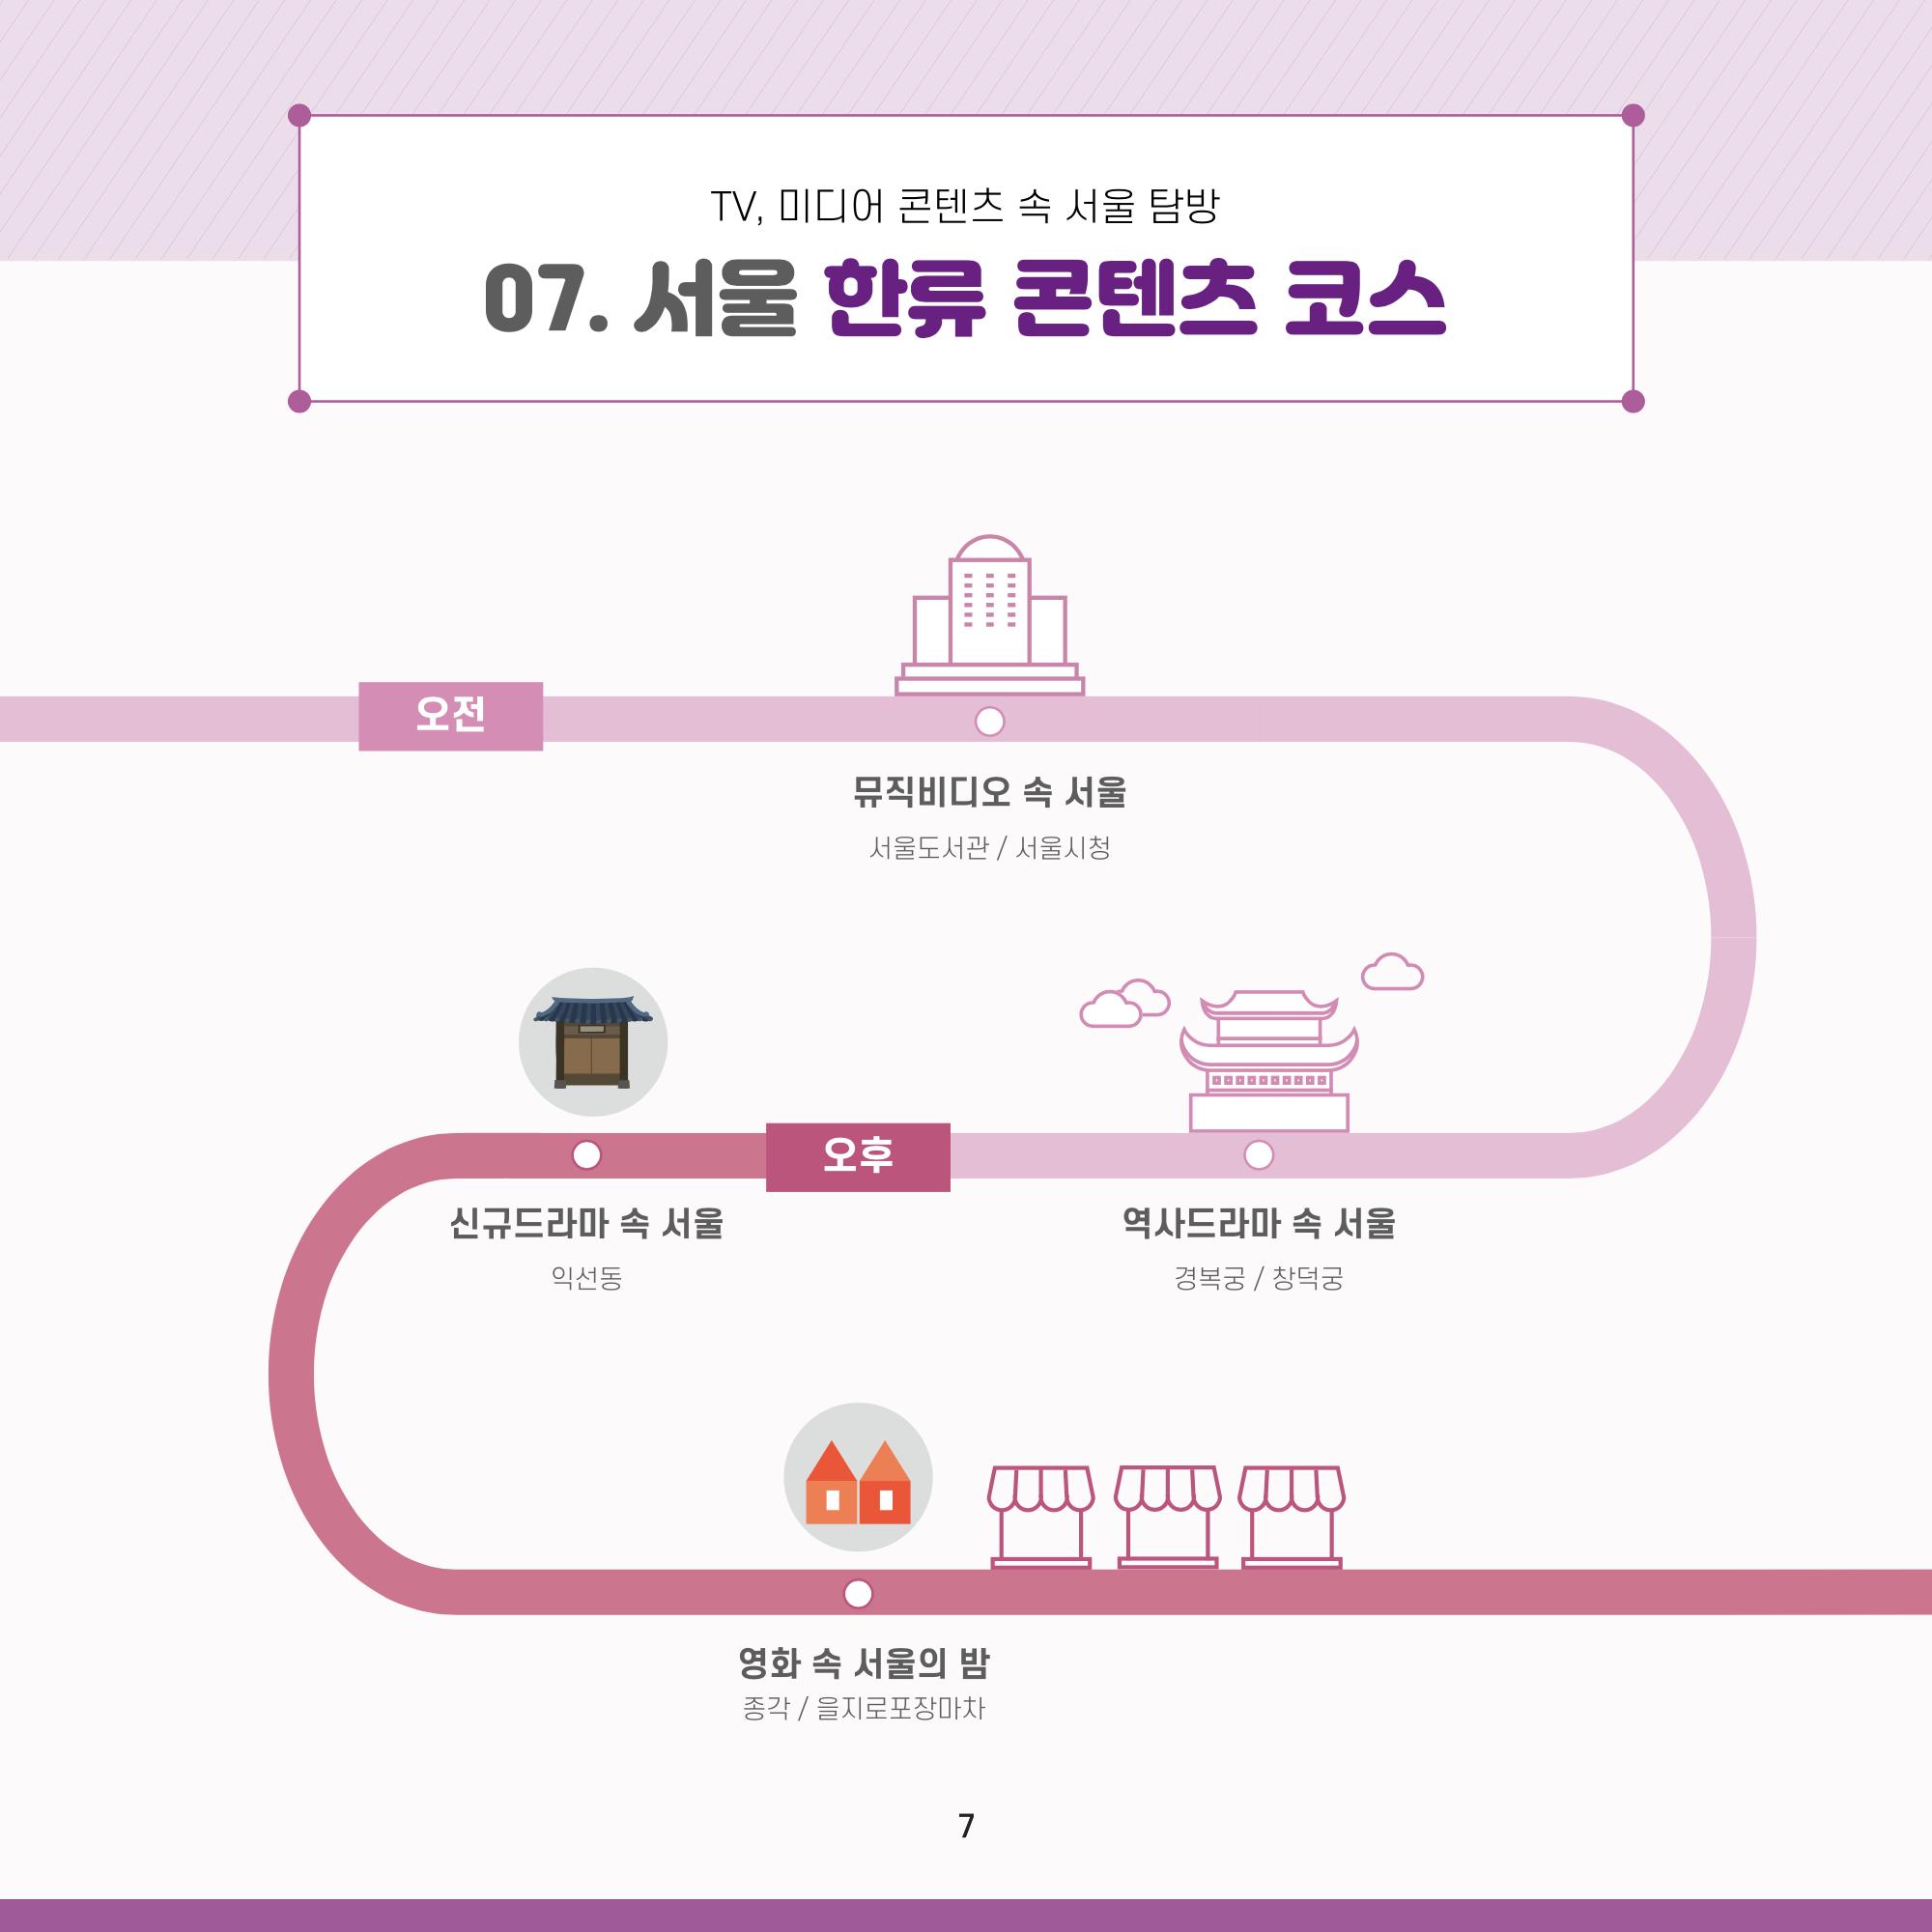 TV, 미디어 콘텐츠 속 서울 탐방 07. 서울 한류 콘텐츠 코스